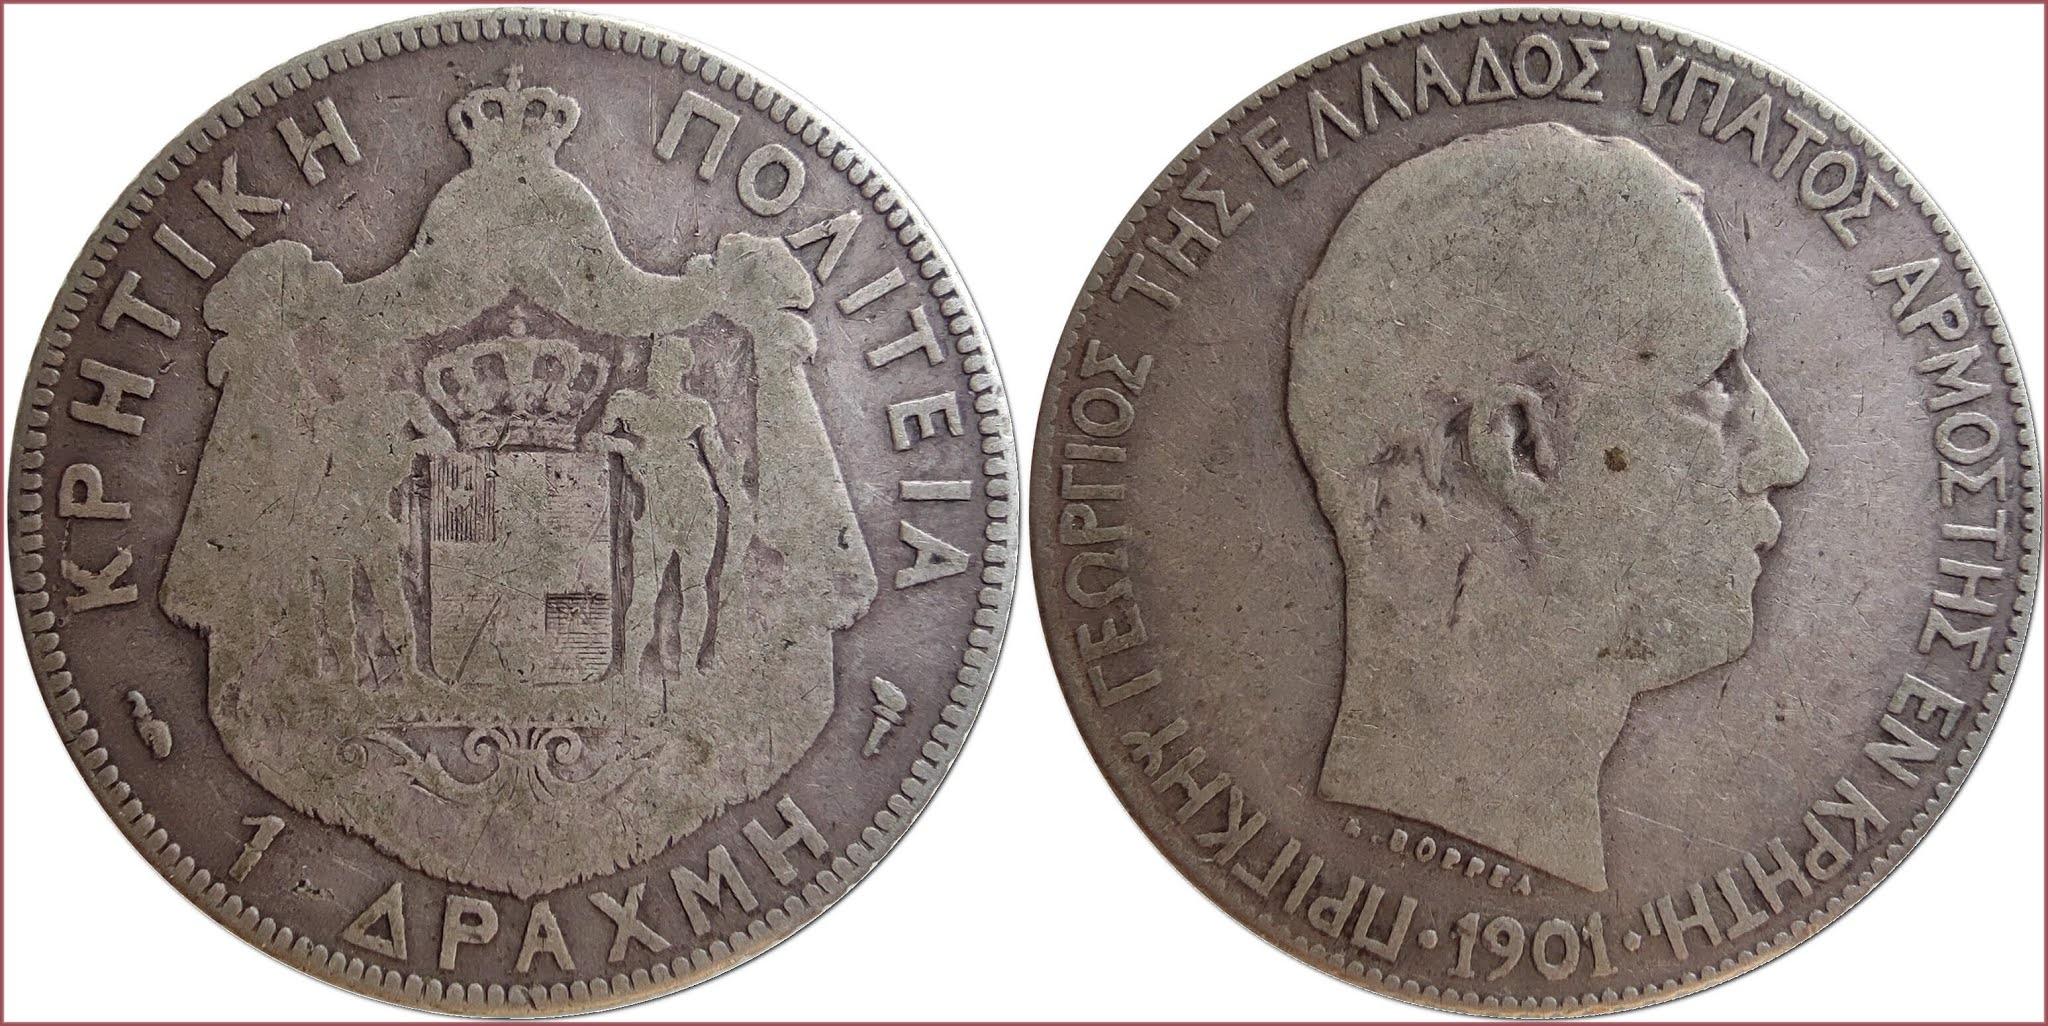 1 drachma (δραχμή), 1901: Cretan State